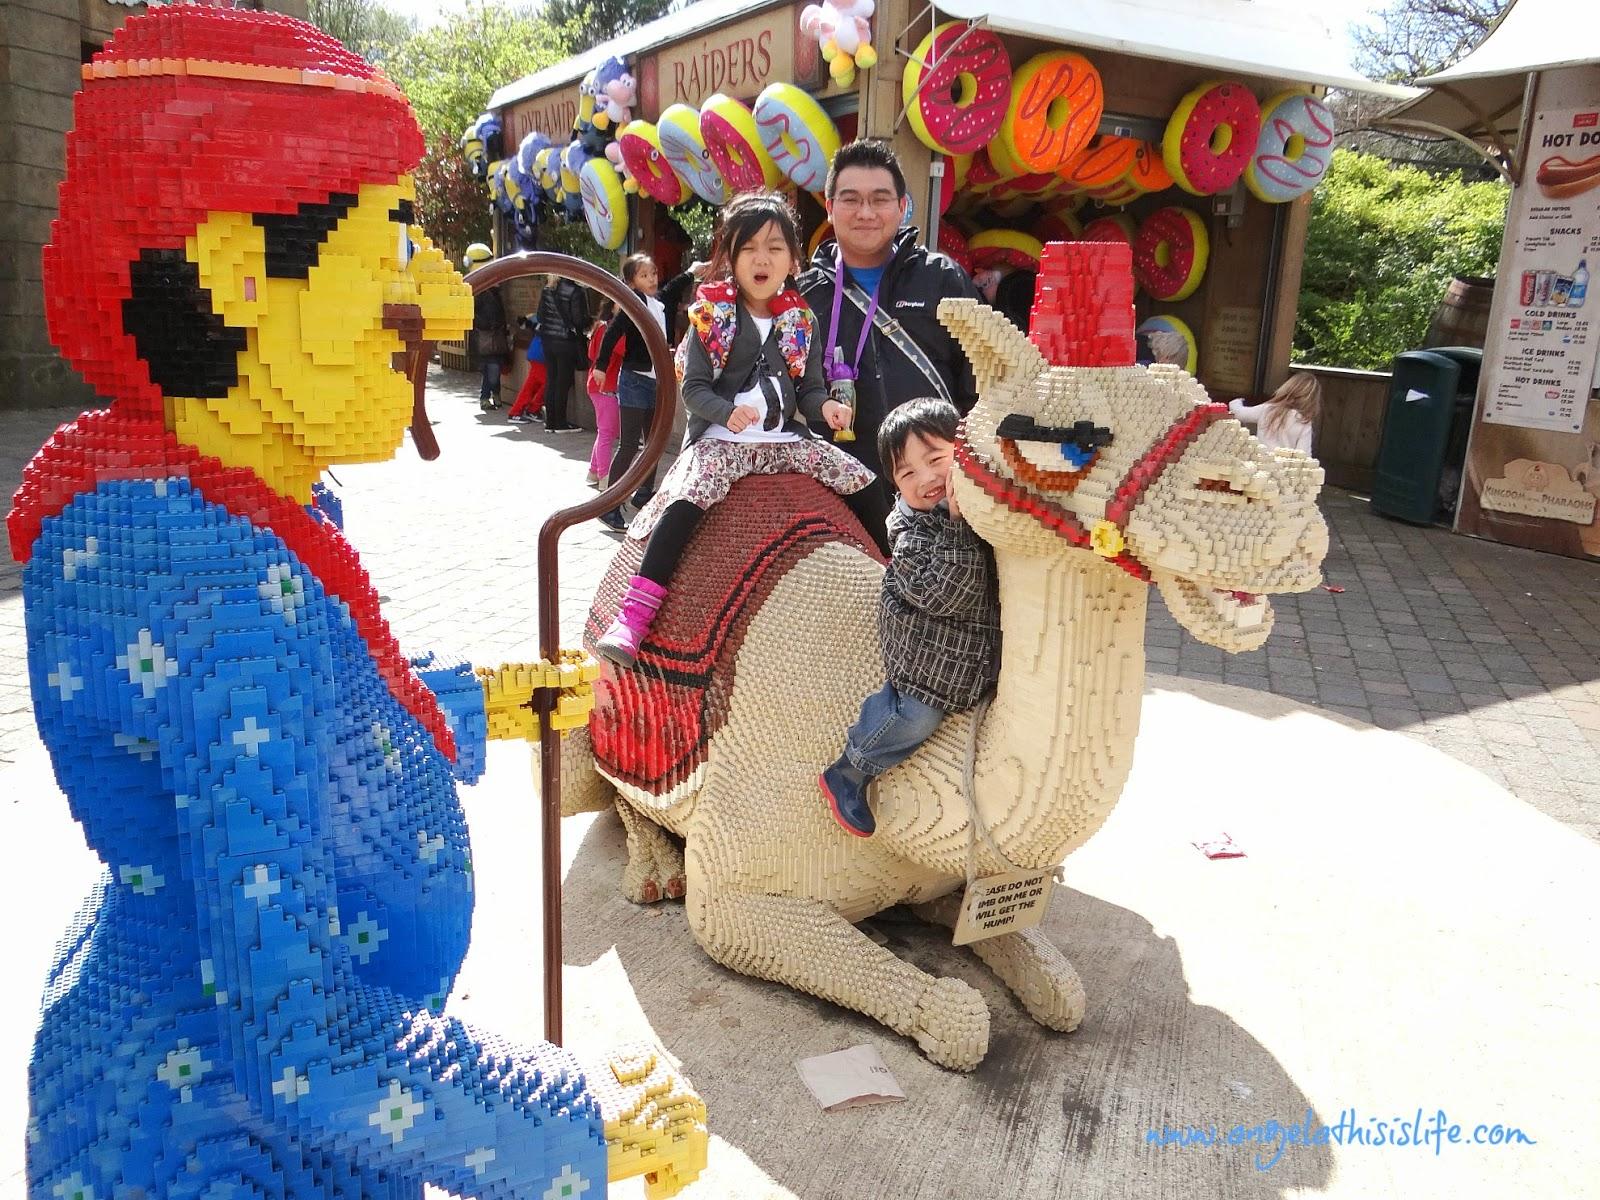 Legoland Windsor 2014, Legoland Windsor Easter, Legoland Windsor Kingdom of Pharaohs